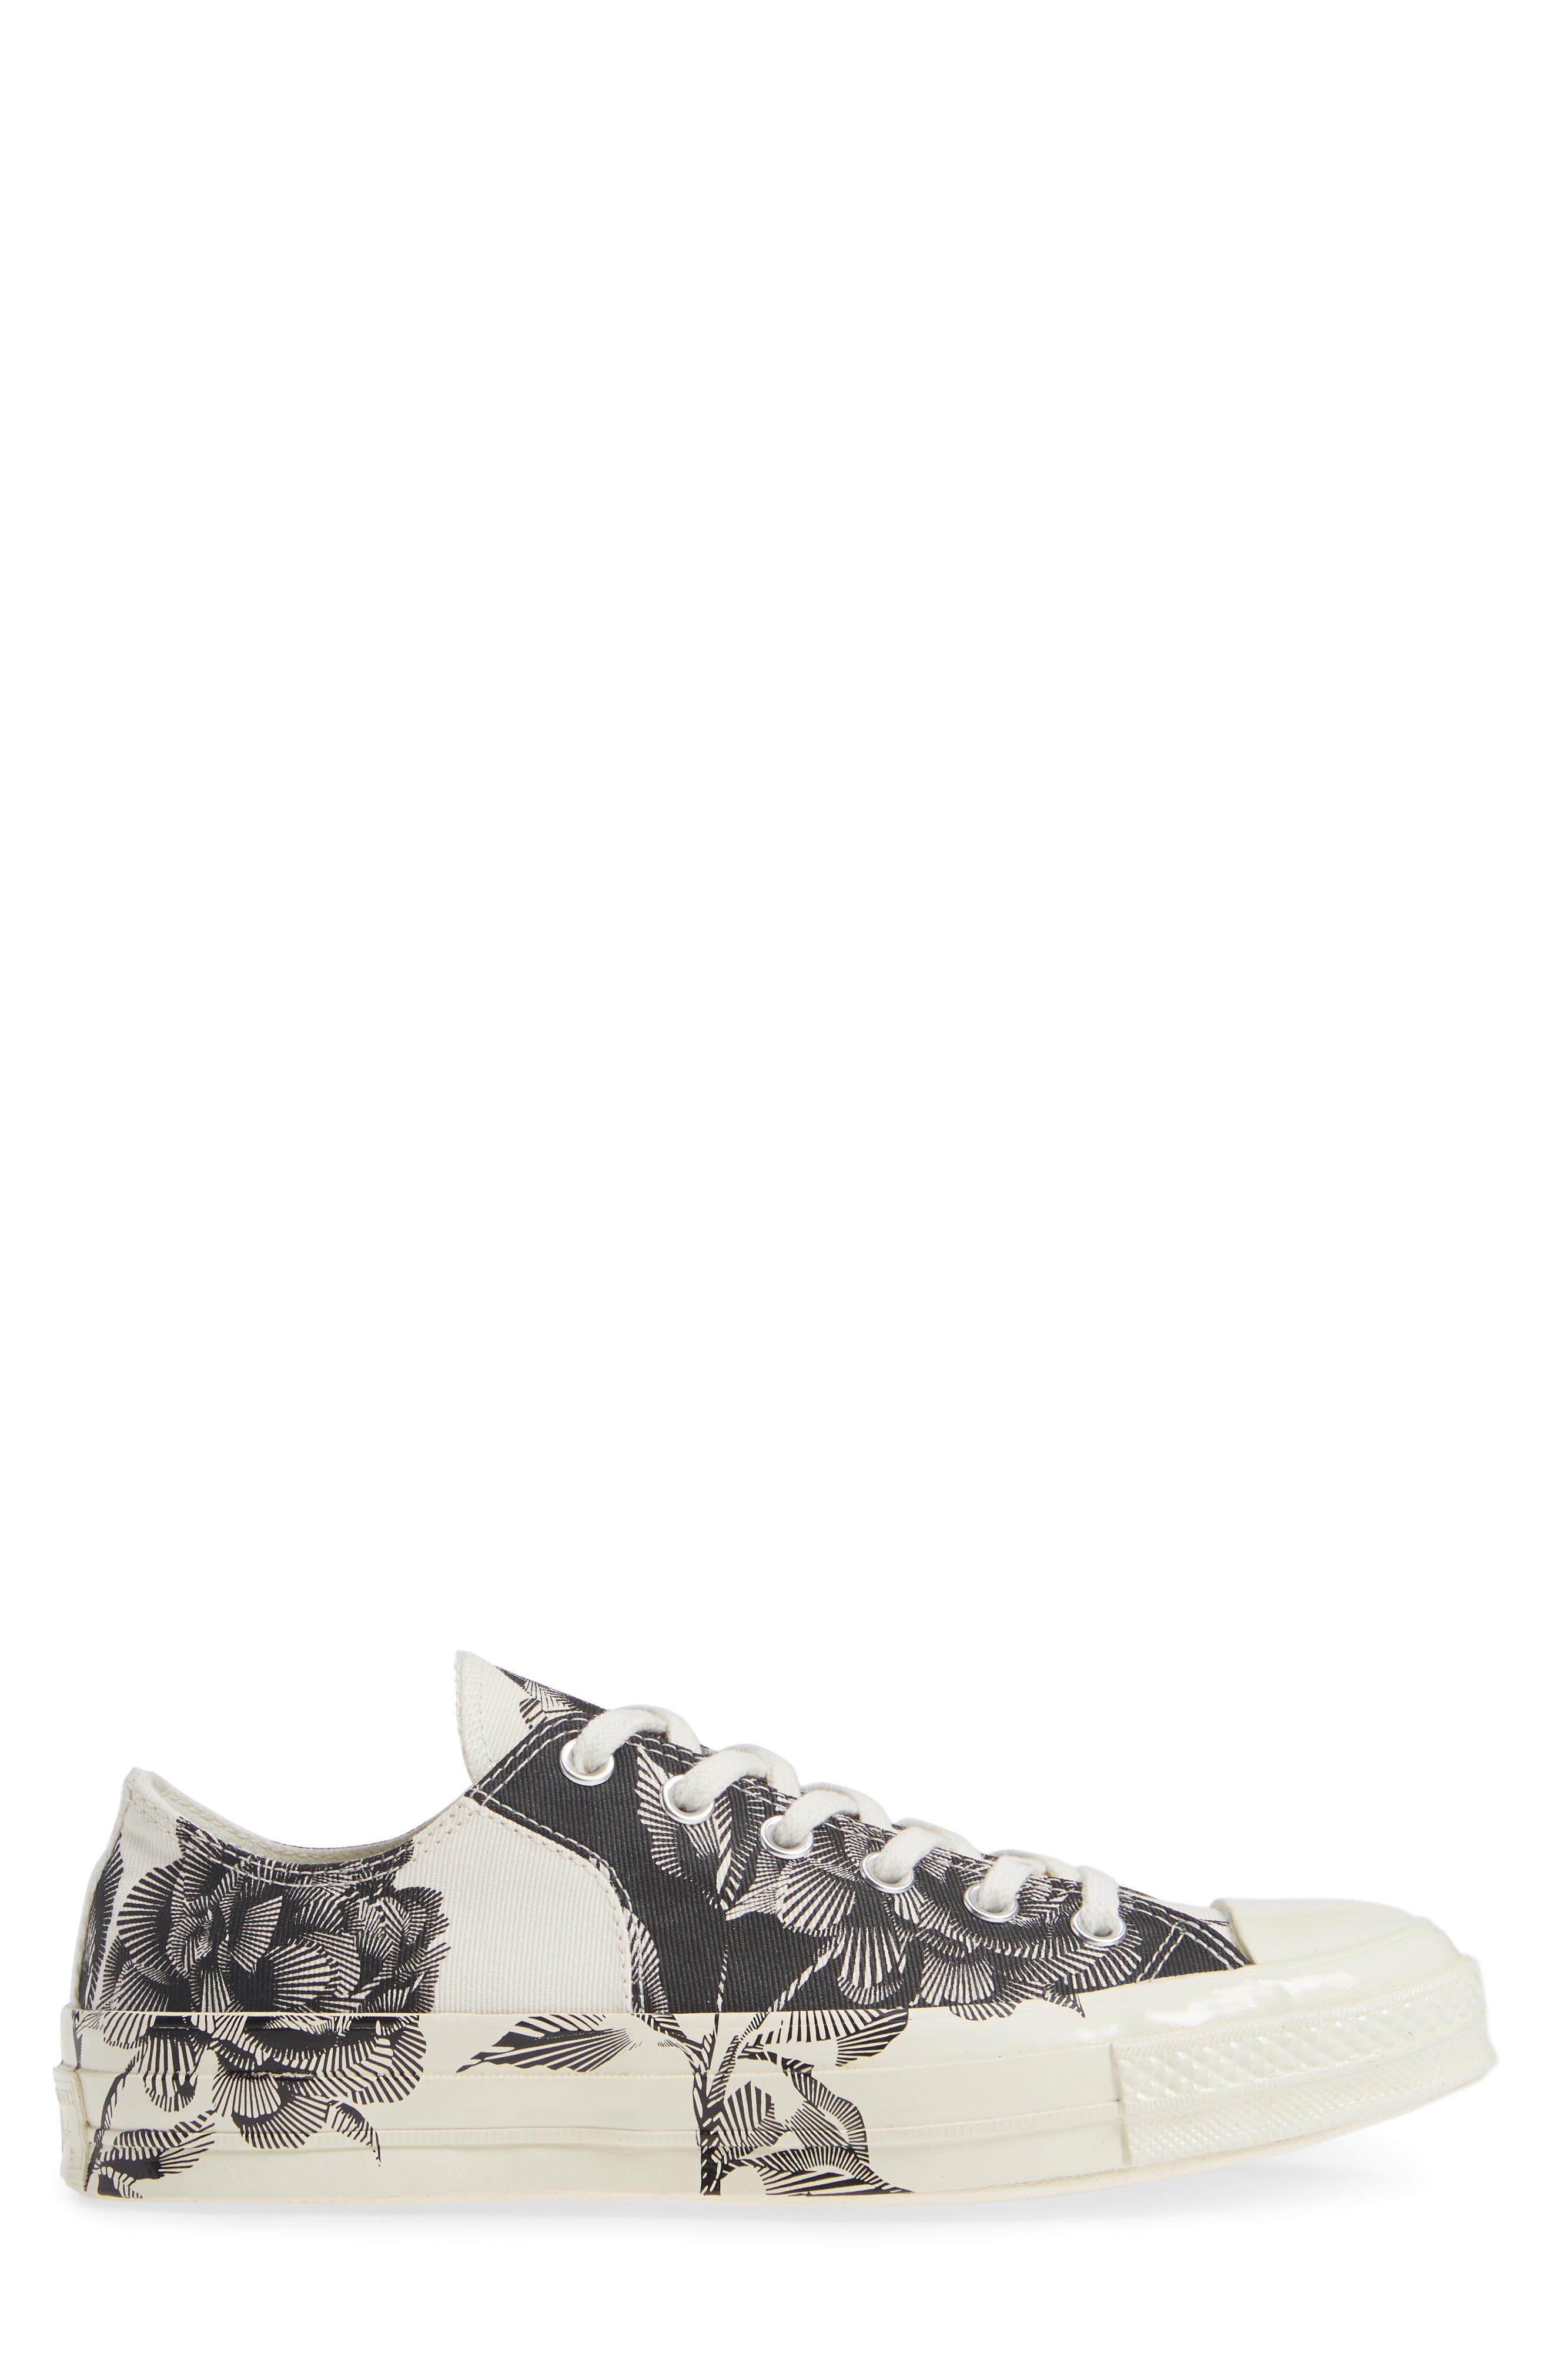 CT 70 Peony Low Top Sneaker,                             Alternate thumbnail 3, color,                             001